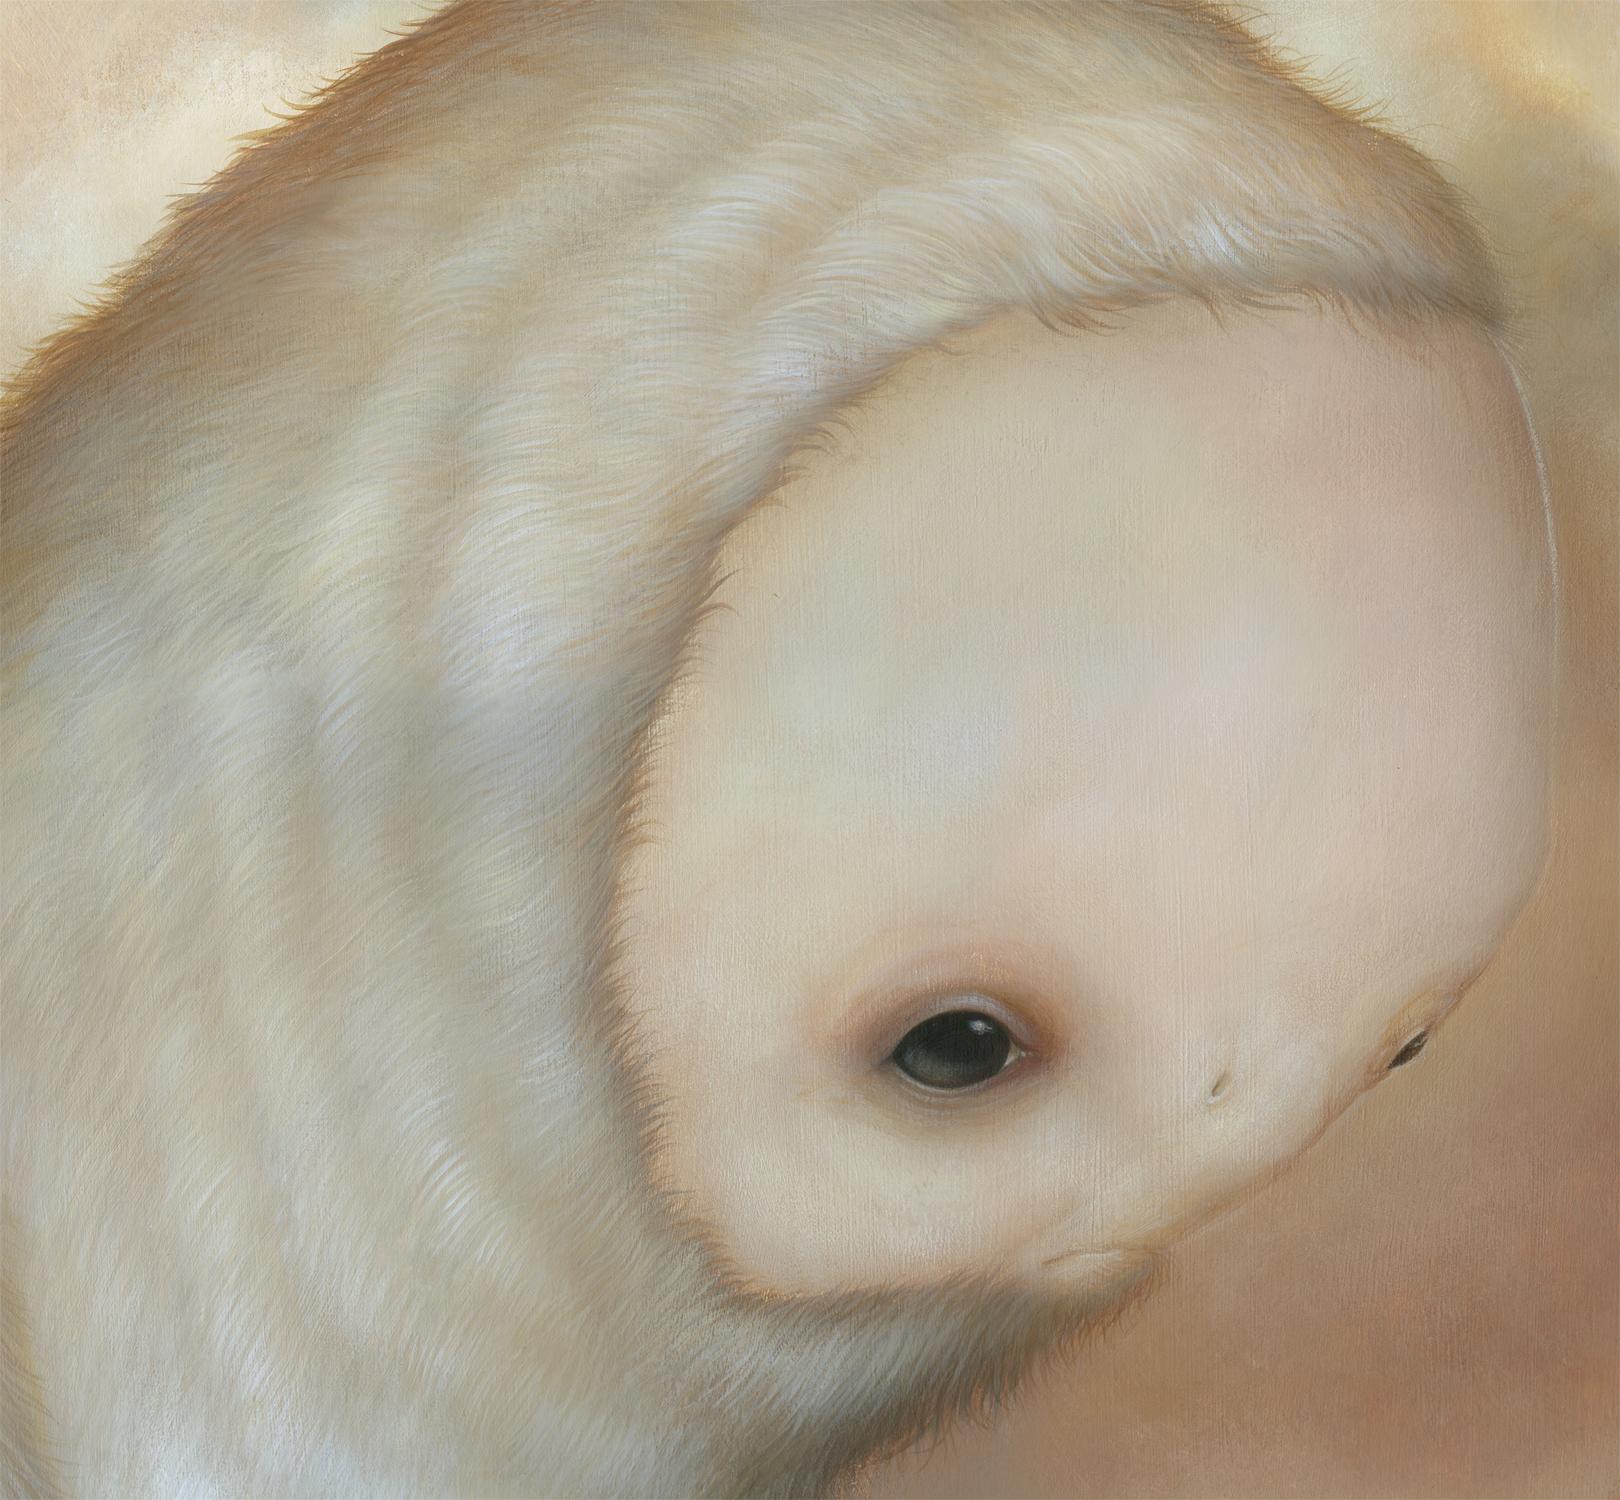 face-detail